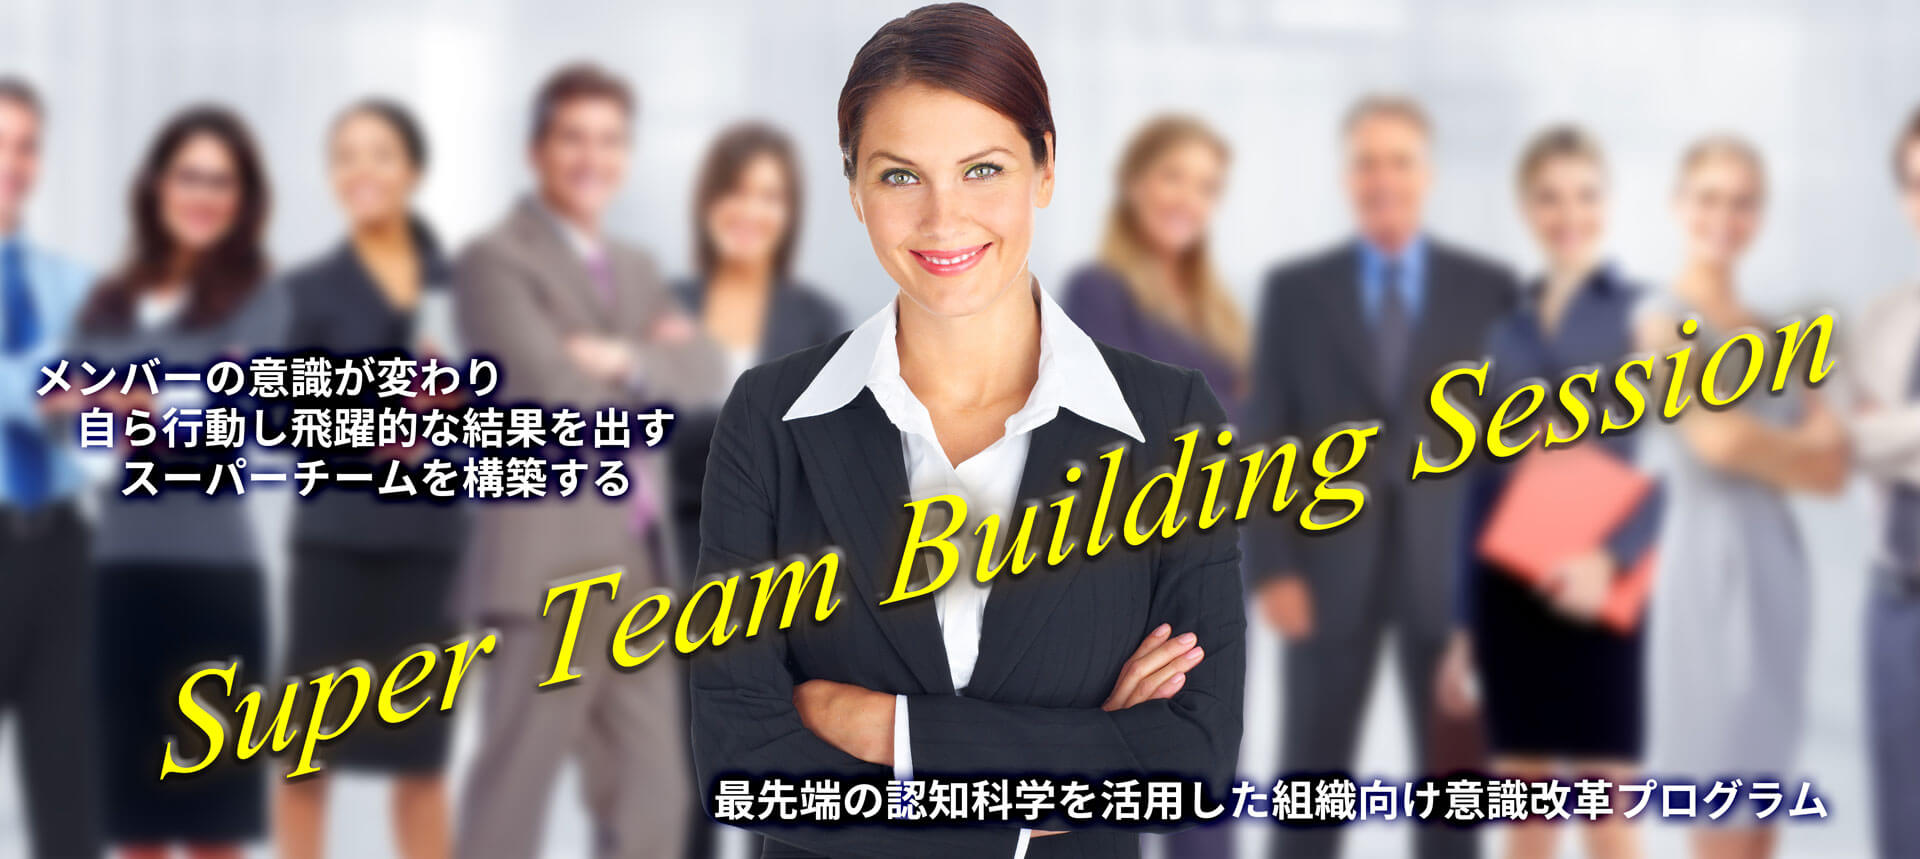 Super Team Building Session